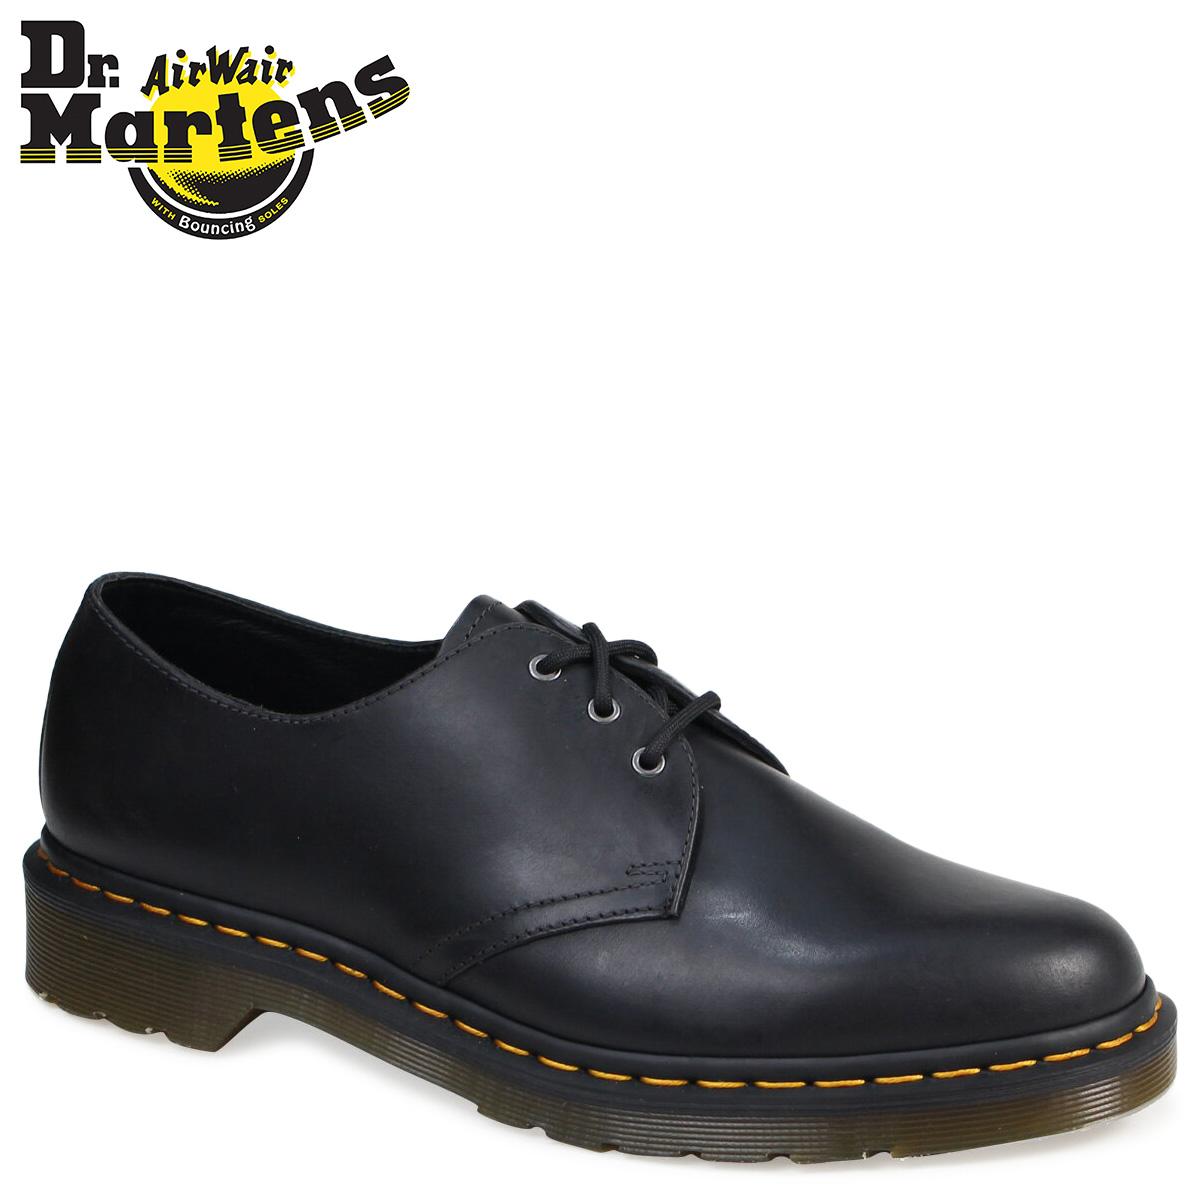 Dr Martens 1461 3 Eye Shoe Size 13 M Gunmetal Orleans